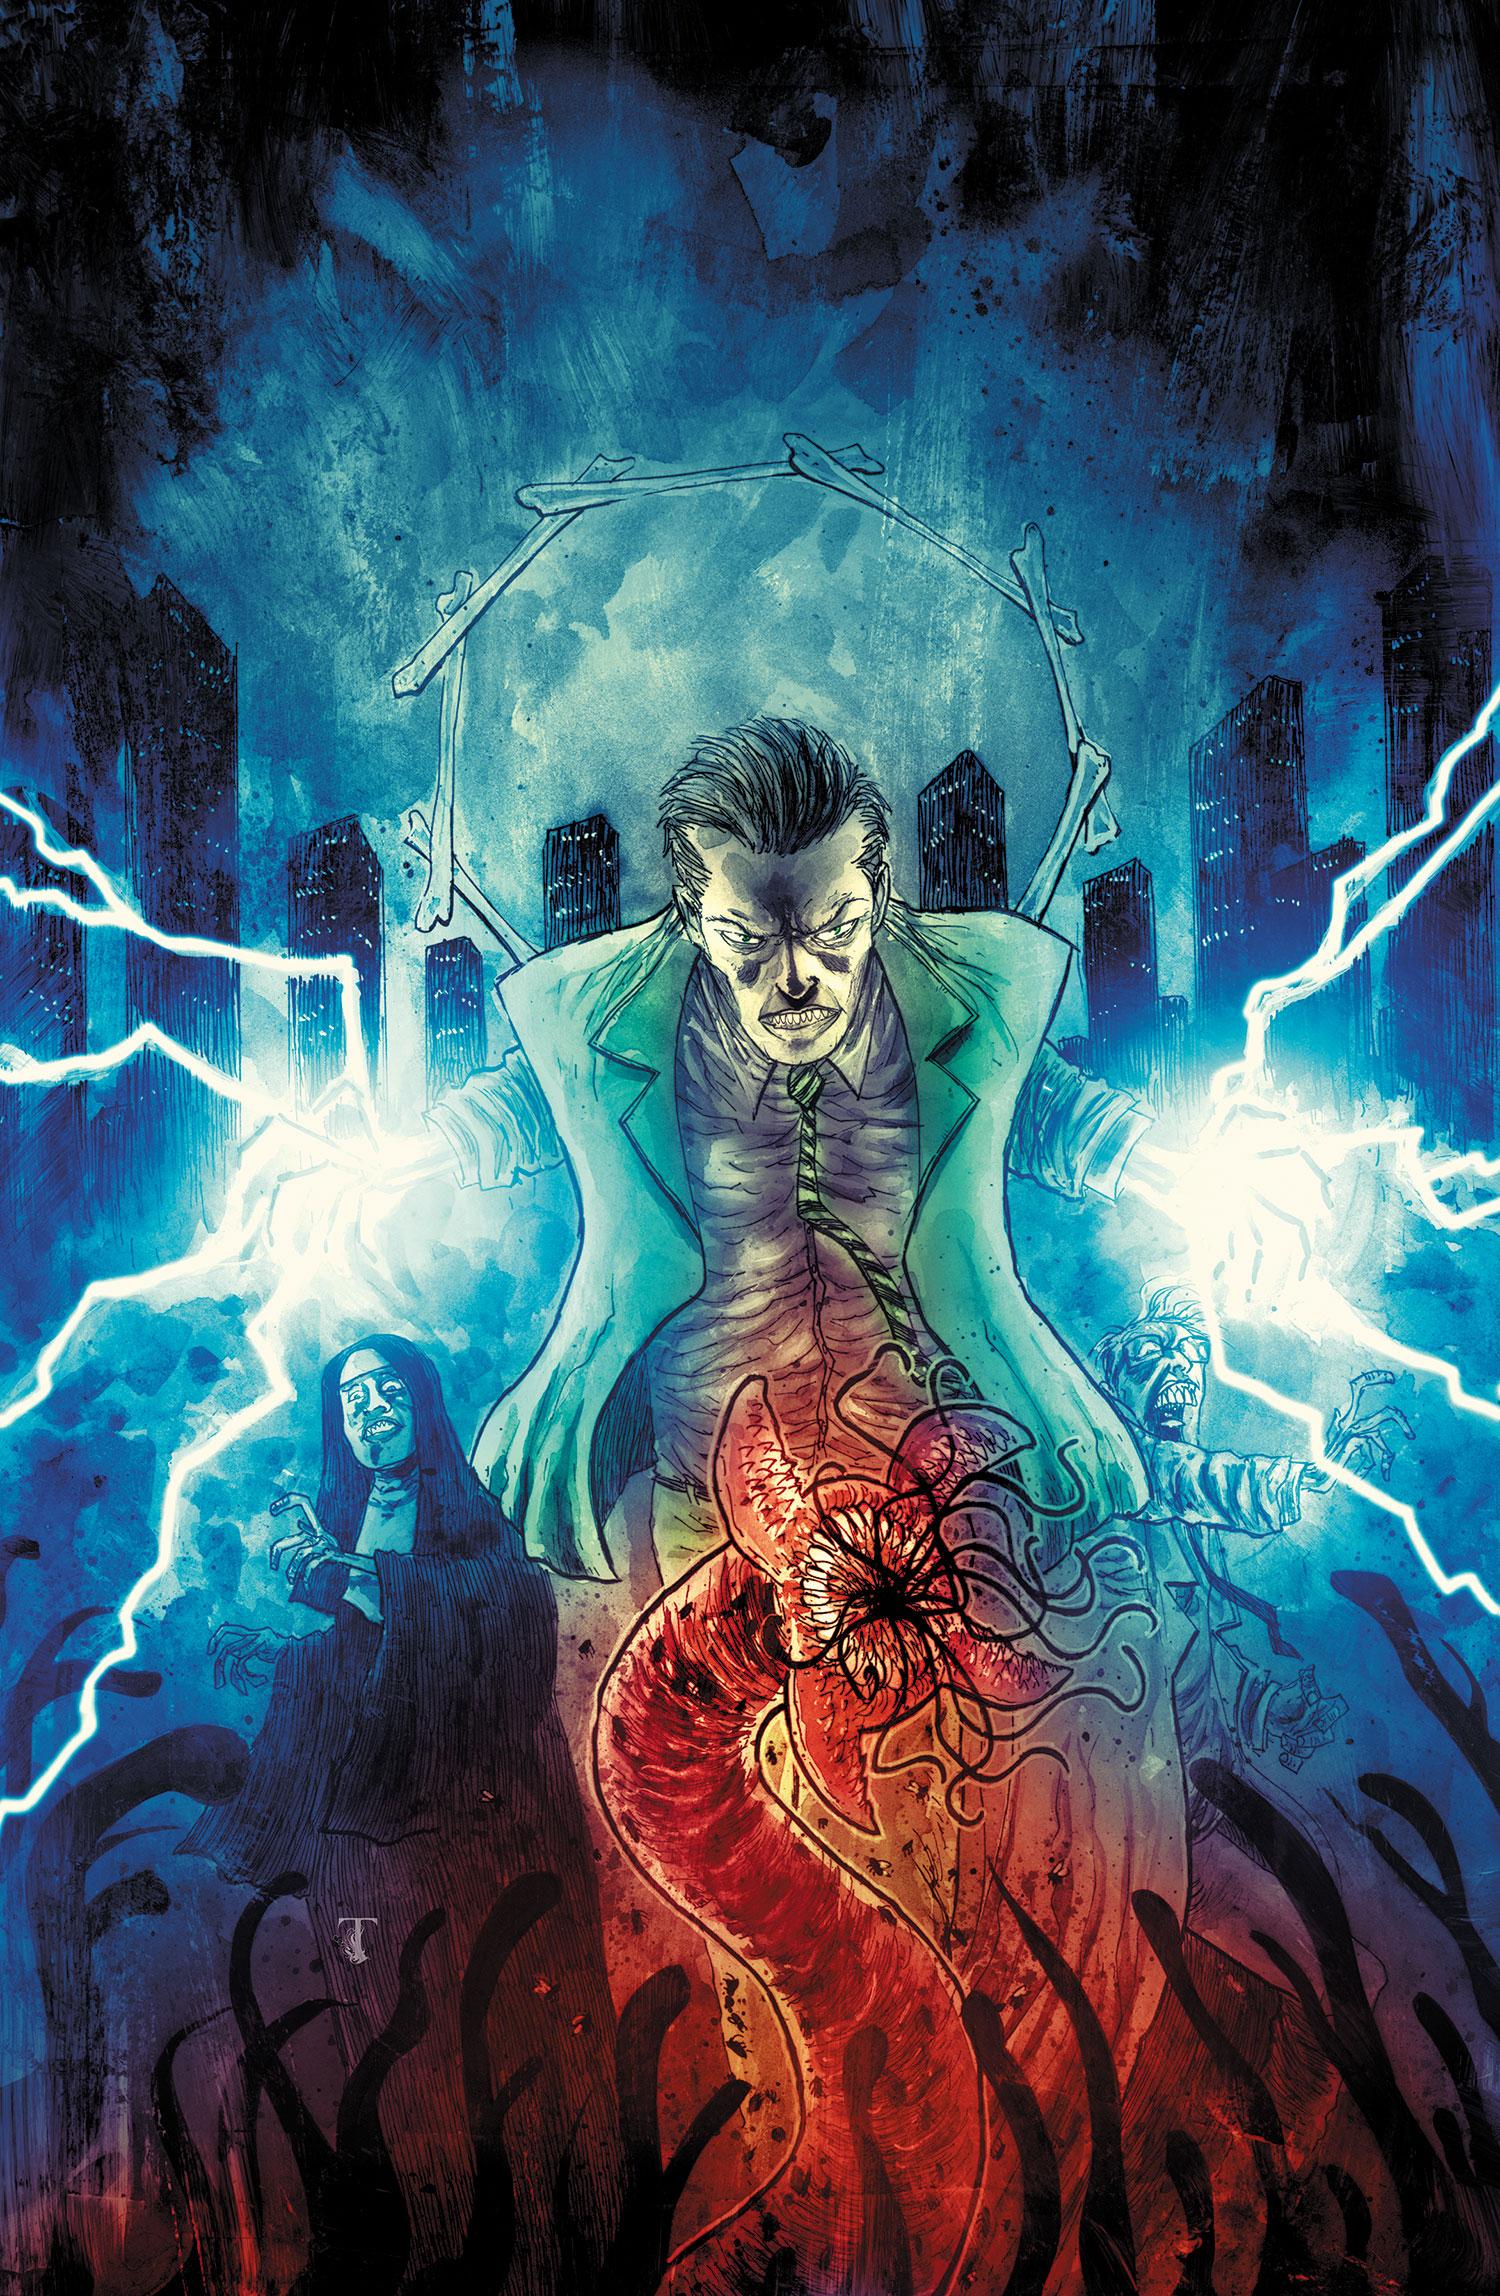 Gotham by Midnight 4